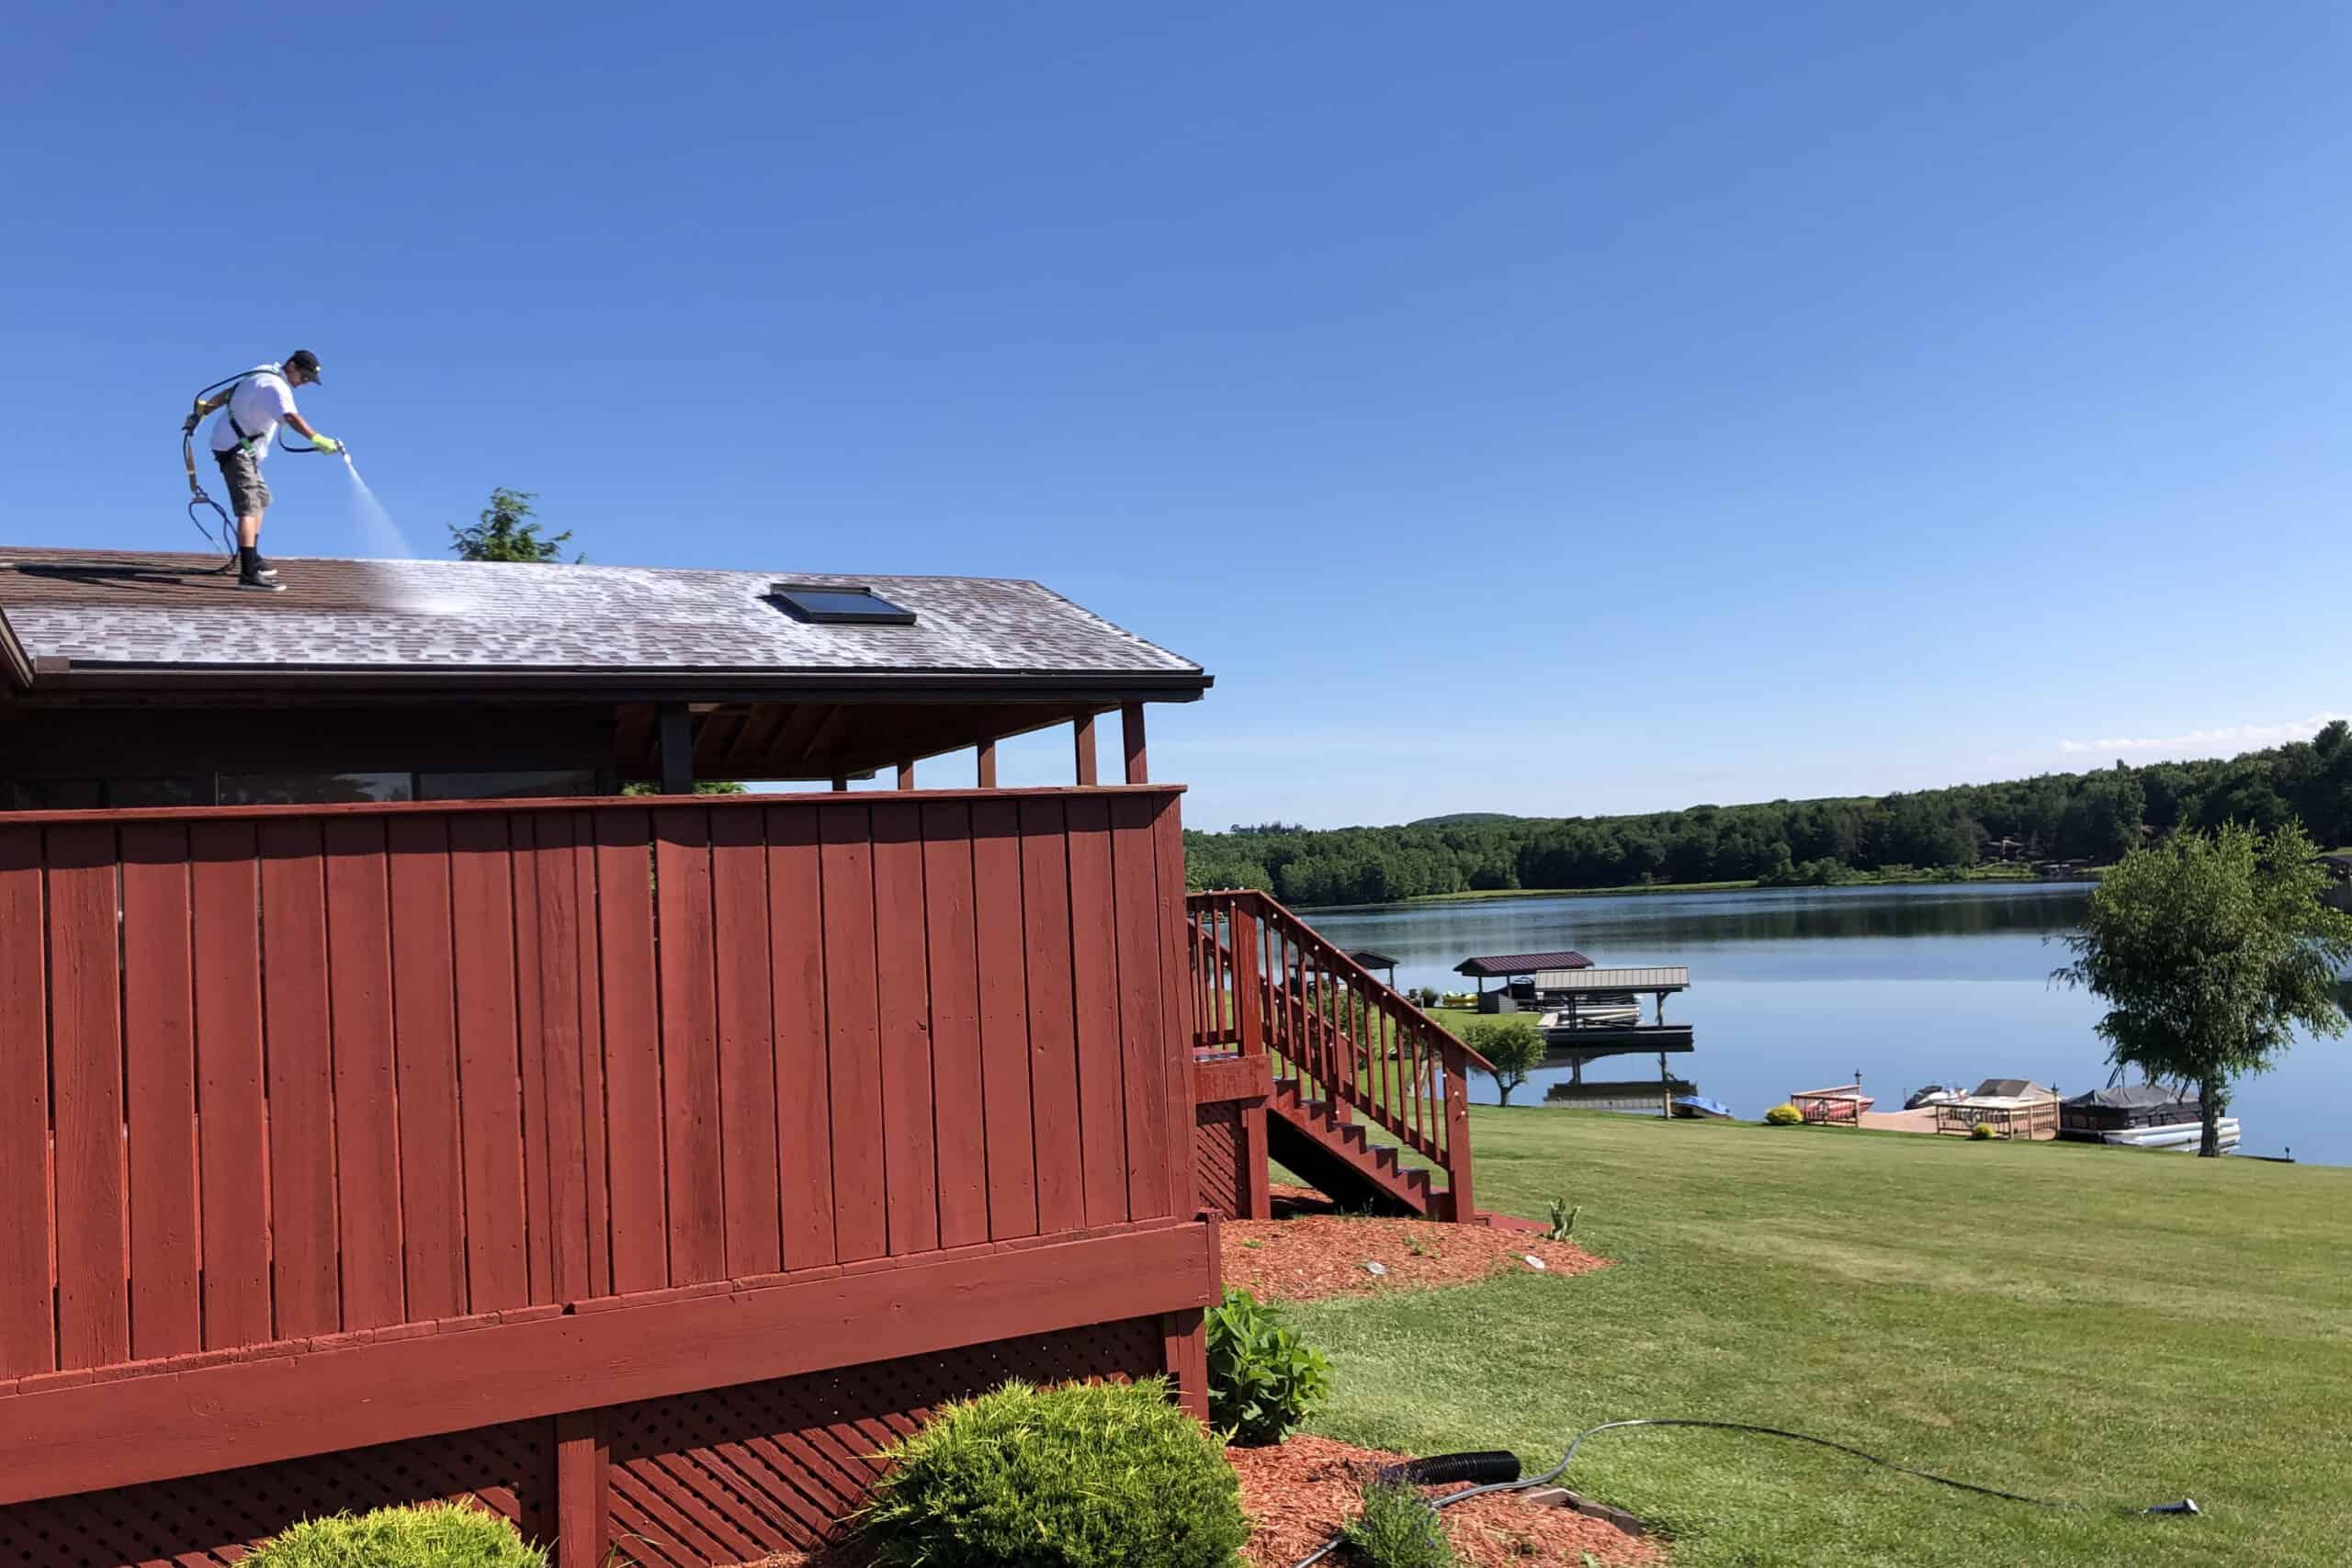 Tech Spraying Roof of Lake House